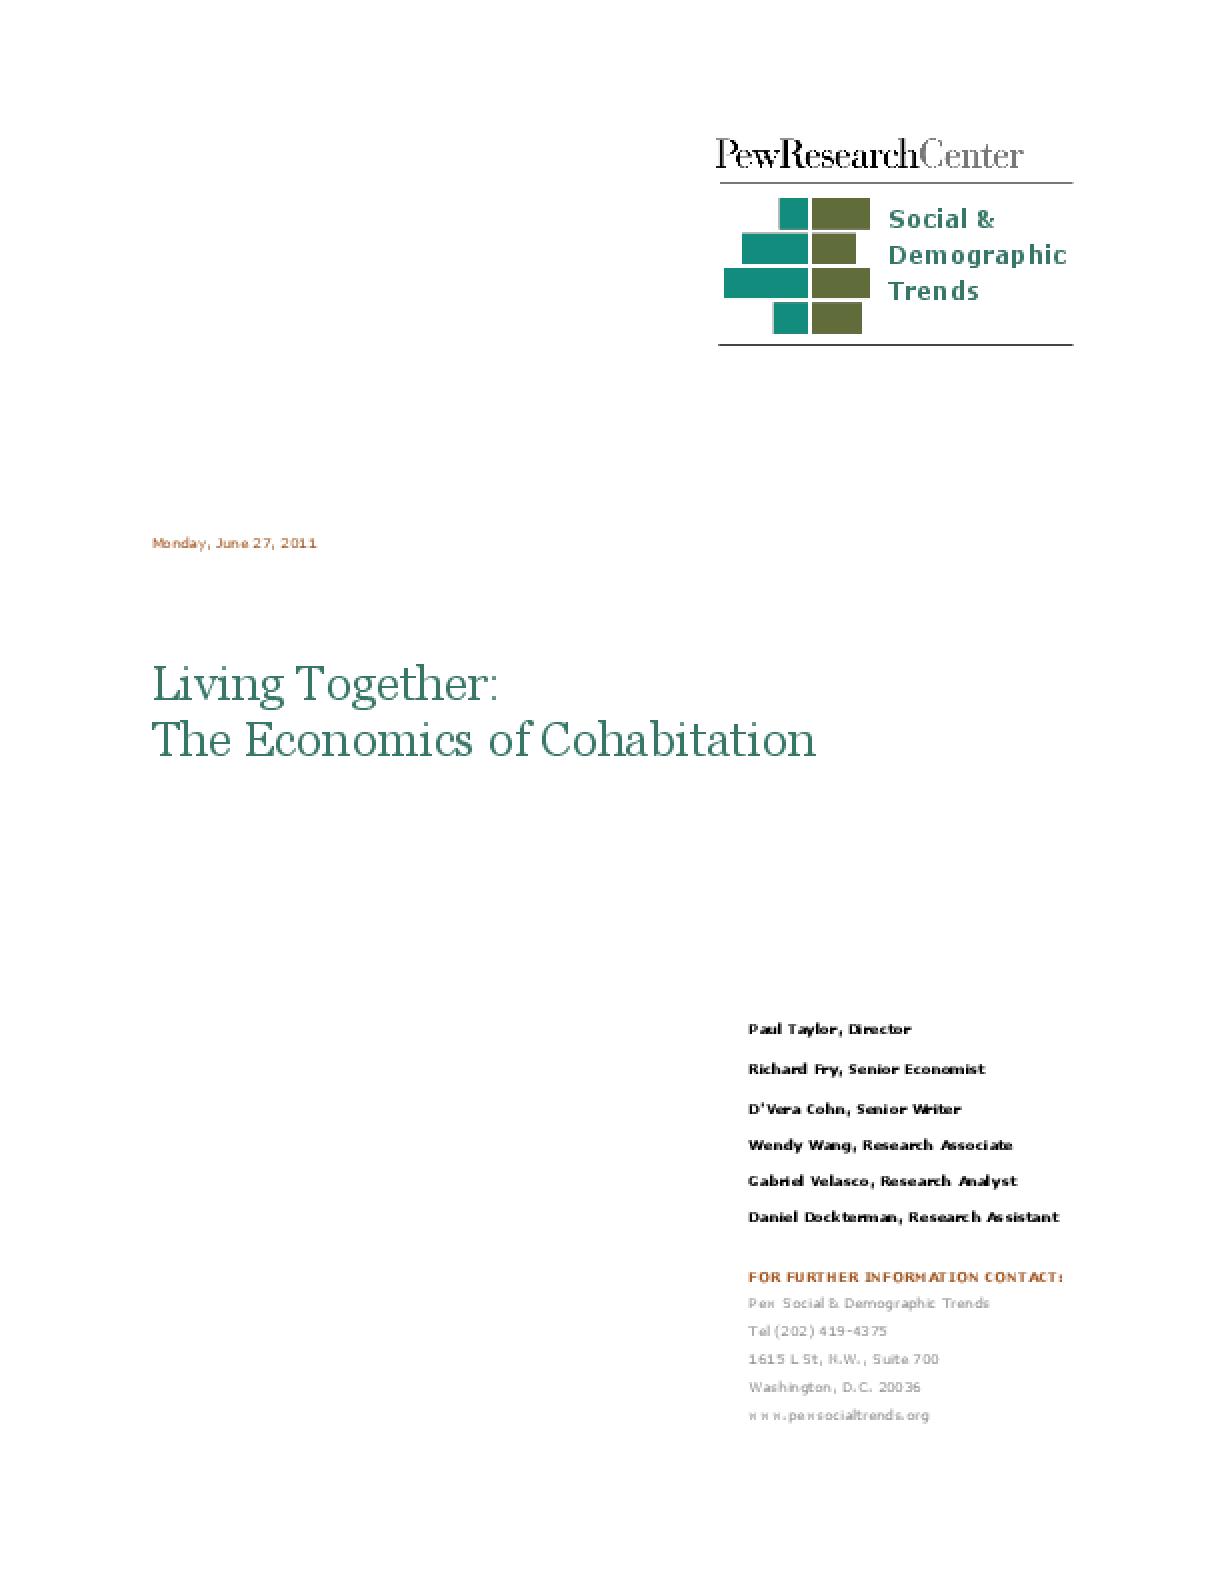 Living Together: The Economics of Cohabitation